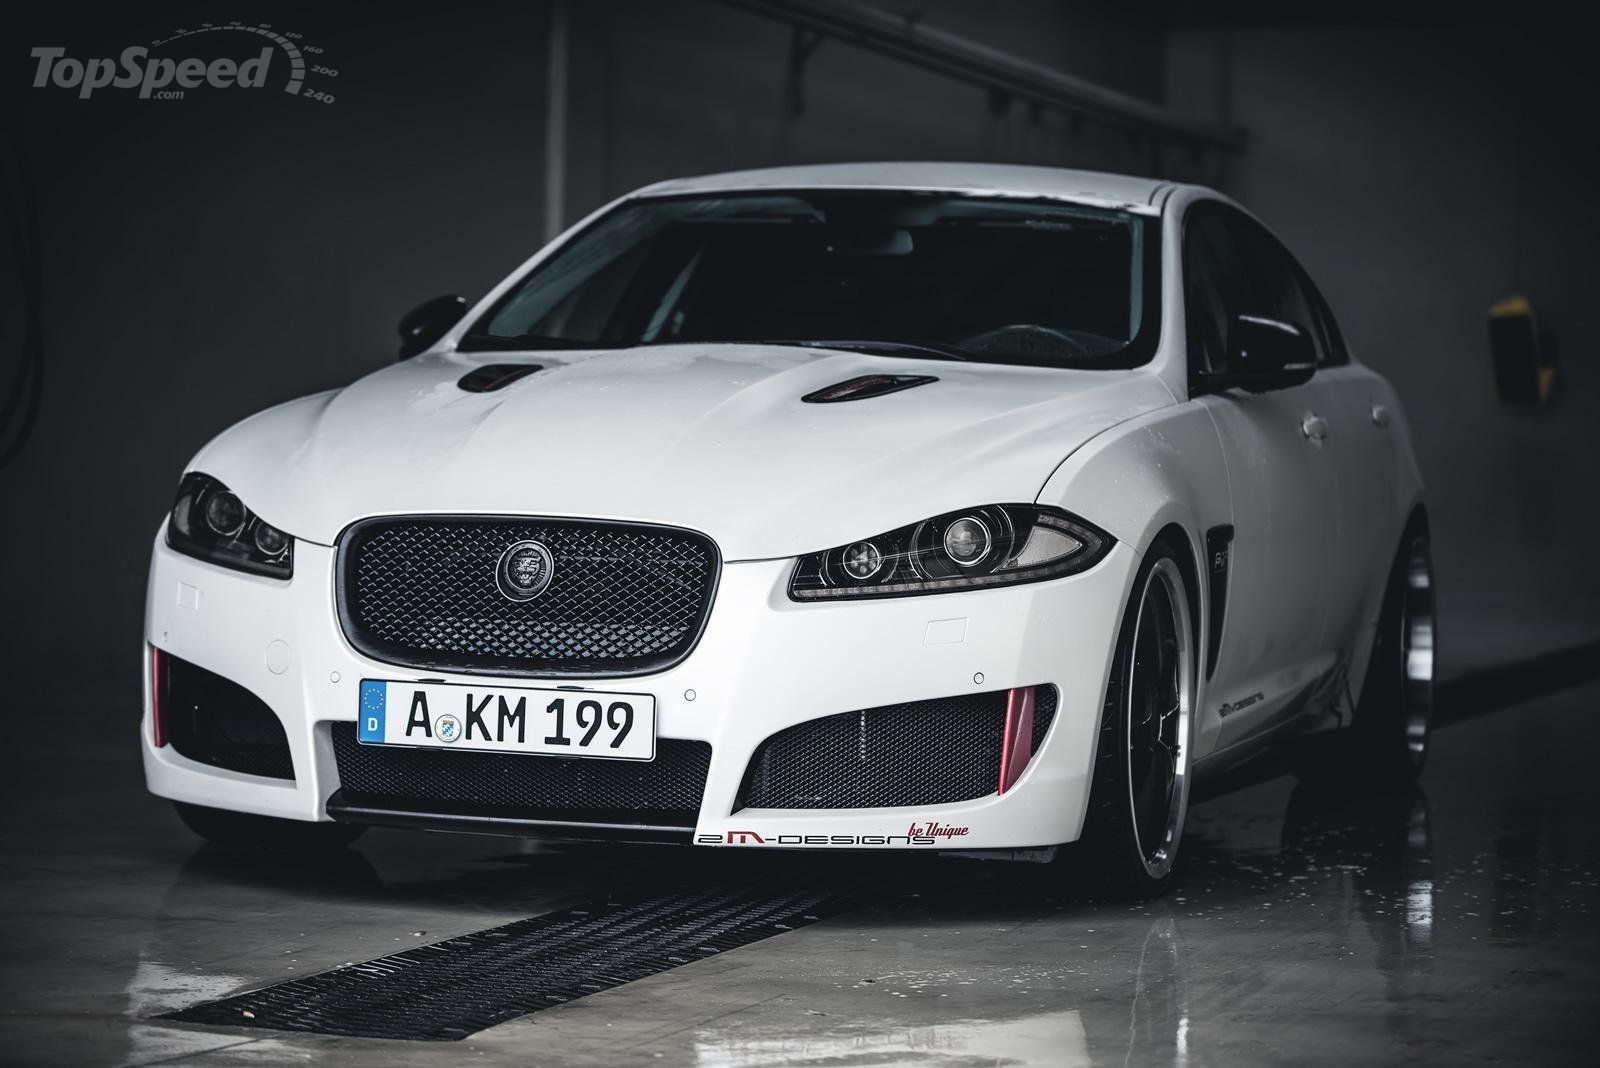 2013 Jaguar Xf By 2m Designs Pictures Photos Wallpapers Top Speed Jaguar Xf 2013 Jaguar Jaguar